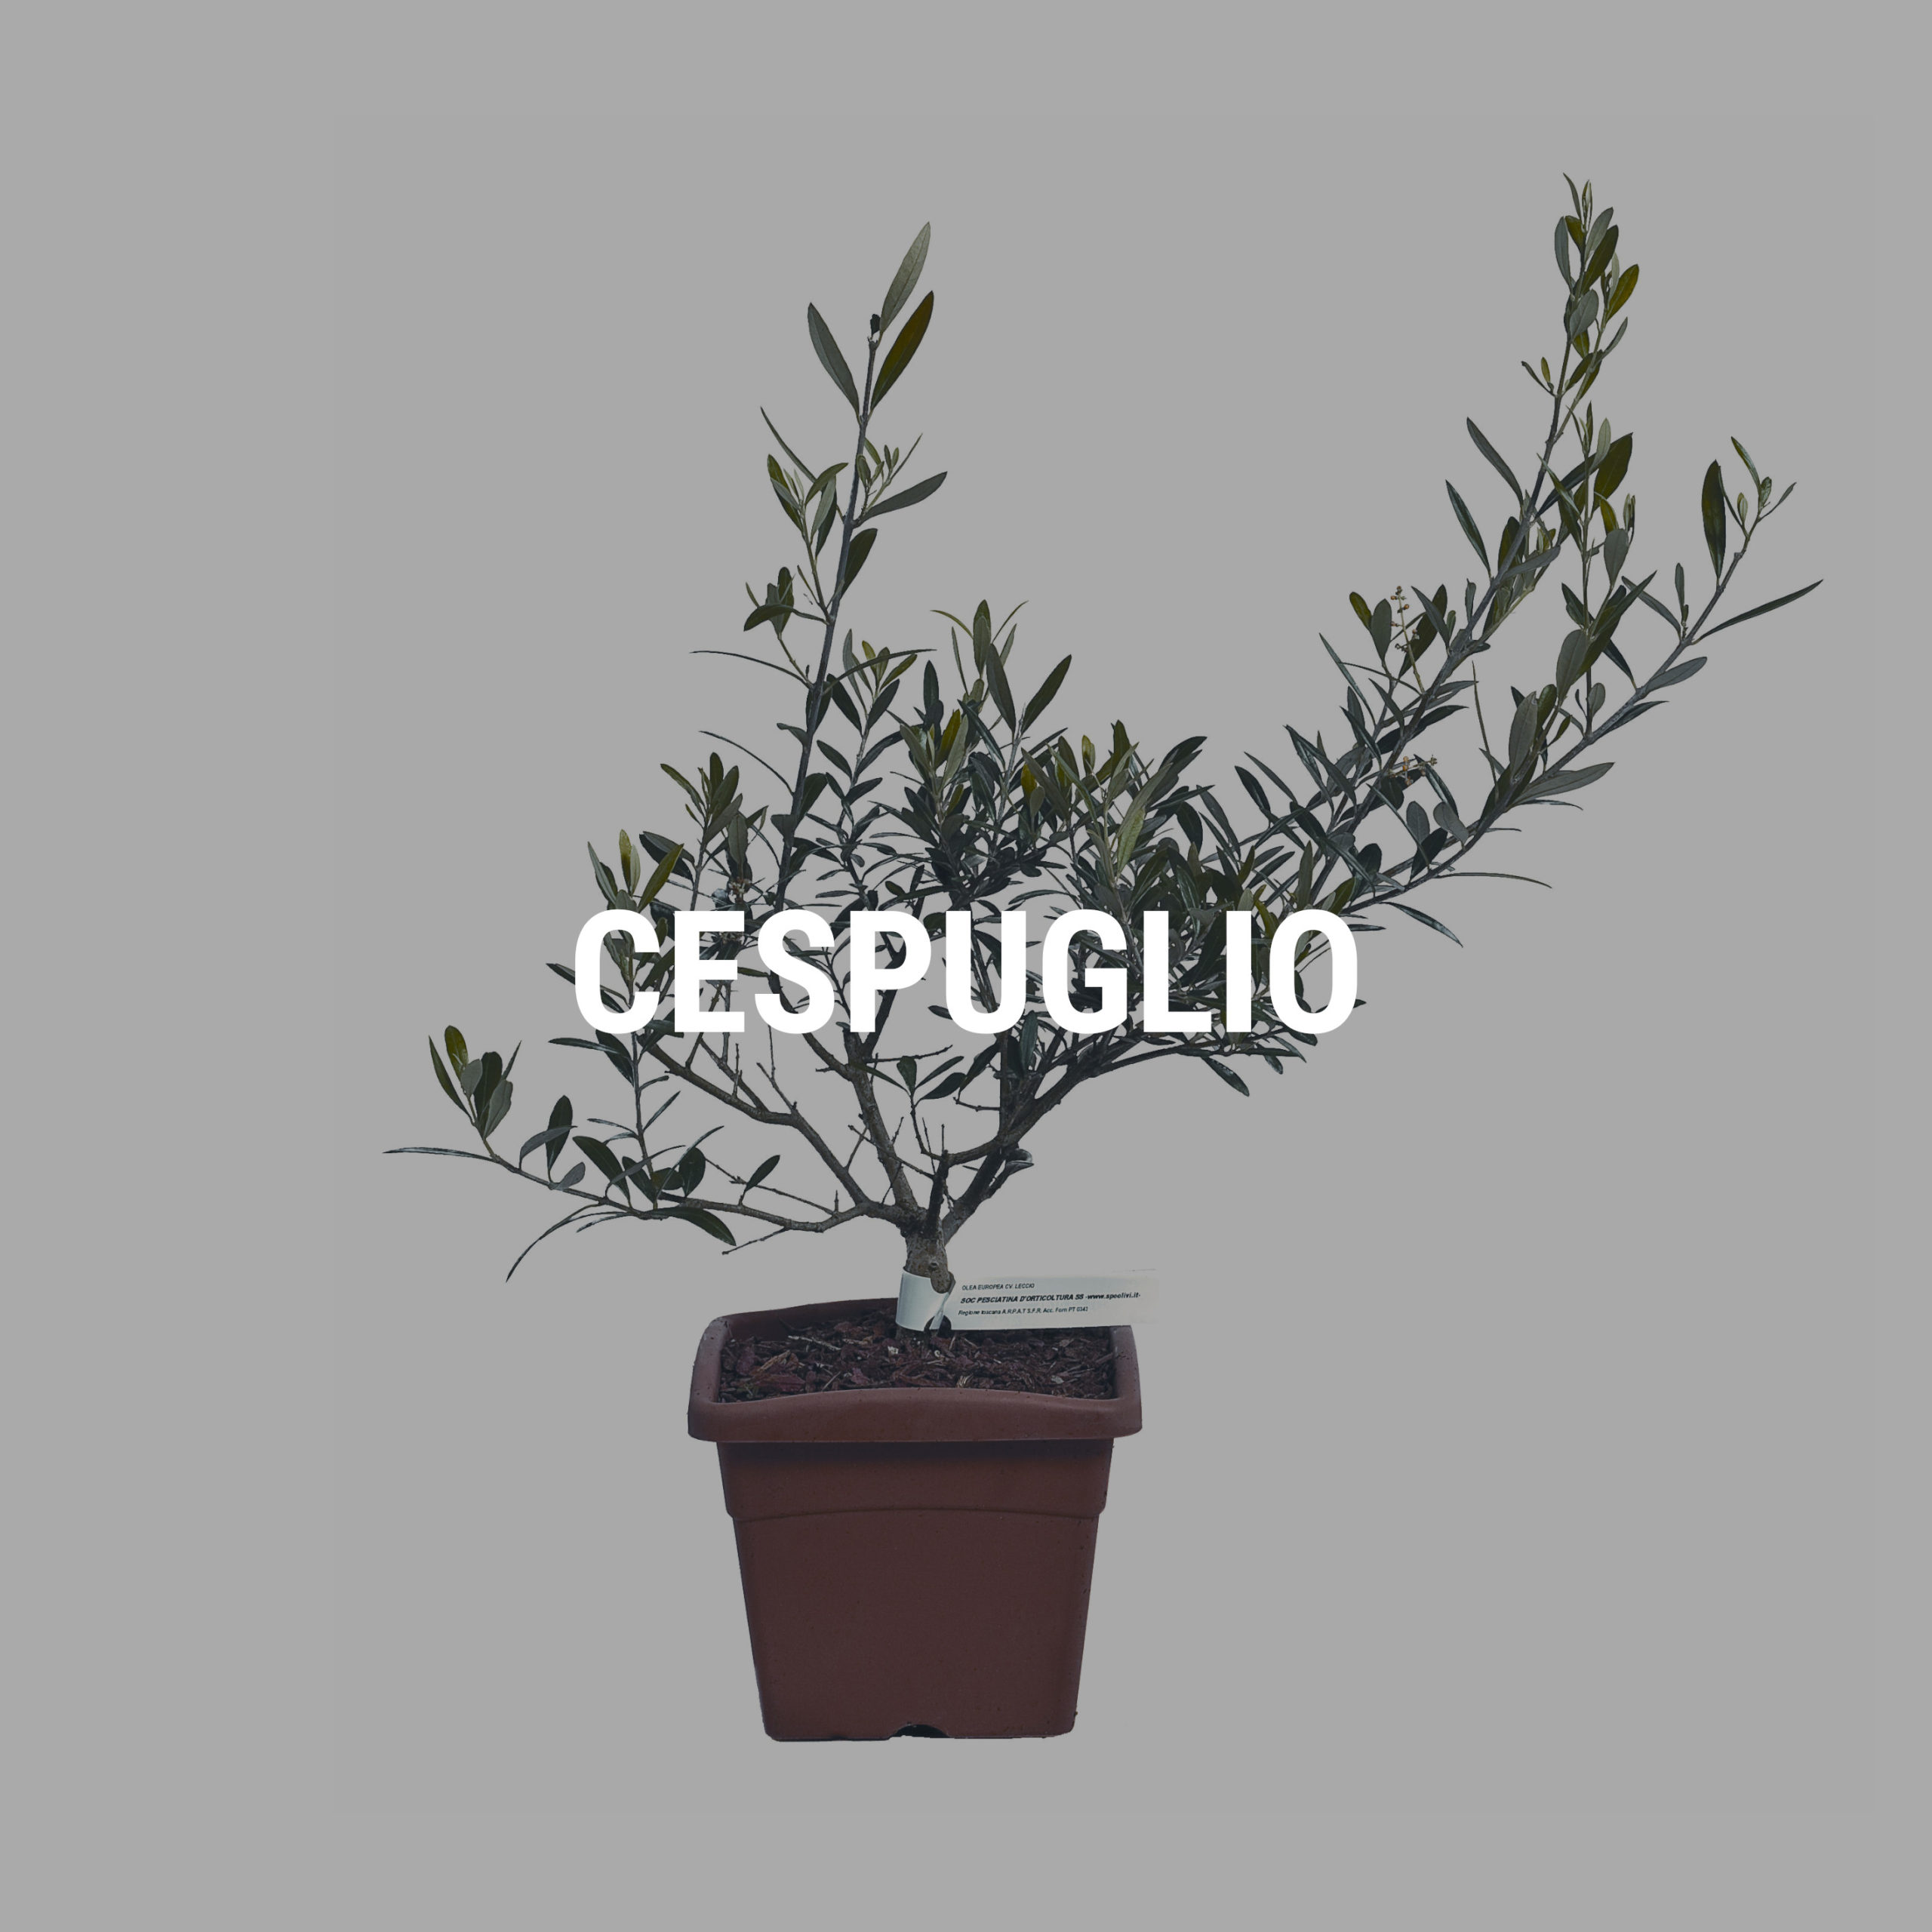 http://www.spoolivi.com/wp-content/uploads/2021/03/cespuglio-2-scaled.jpg